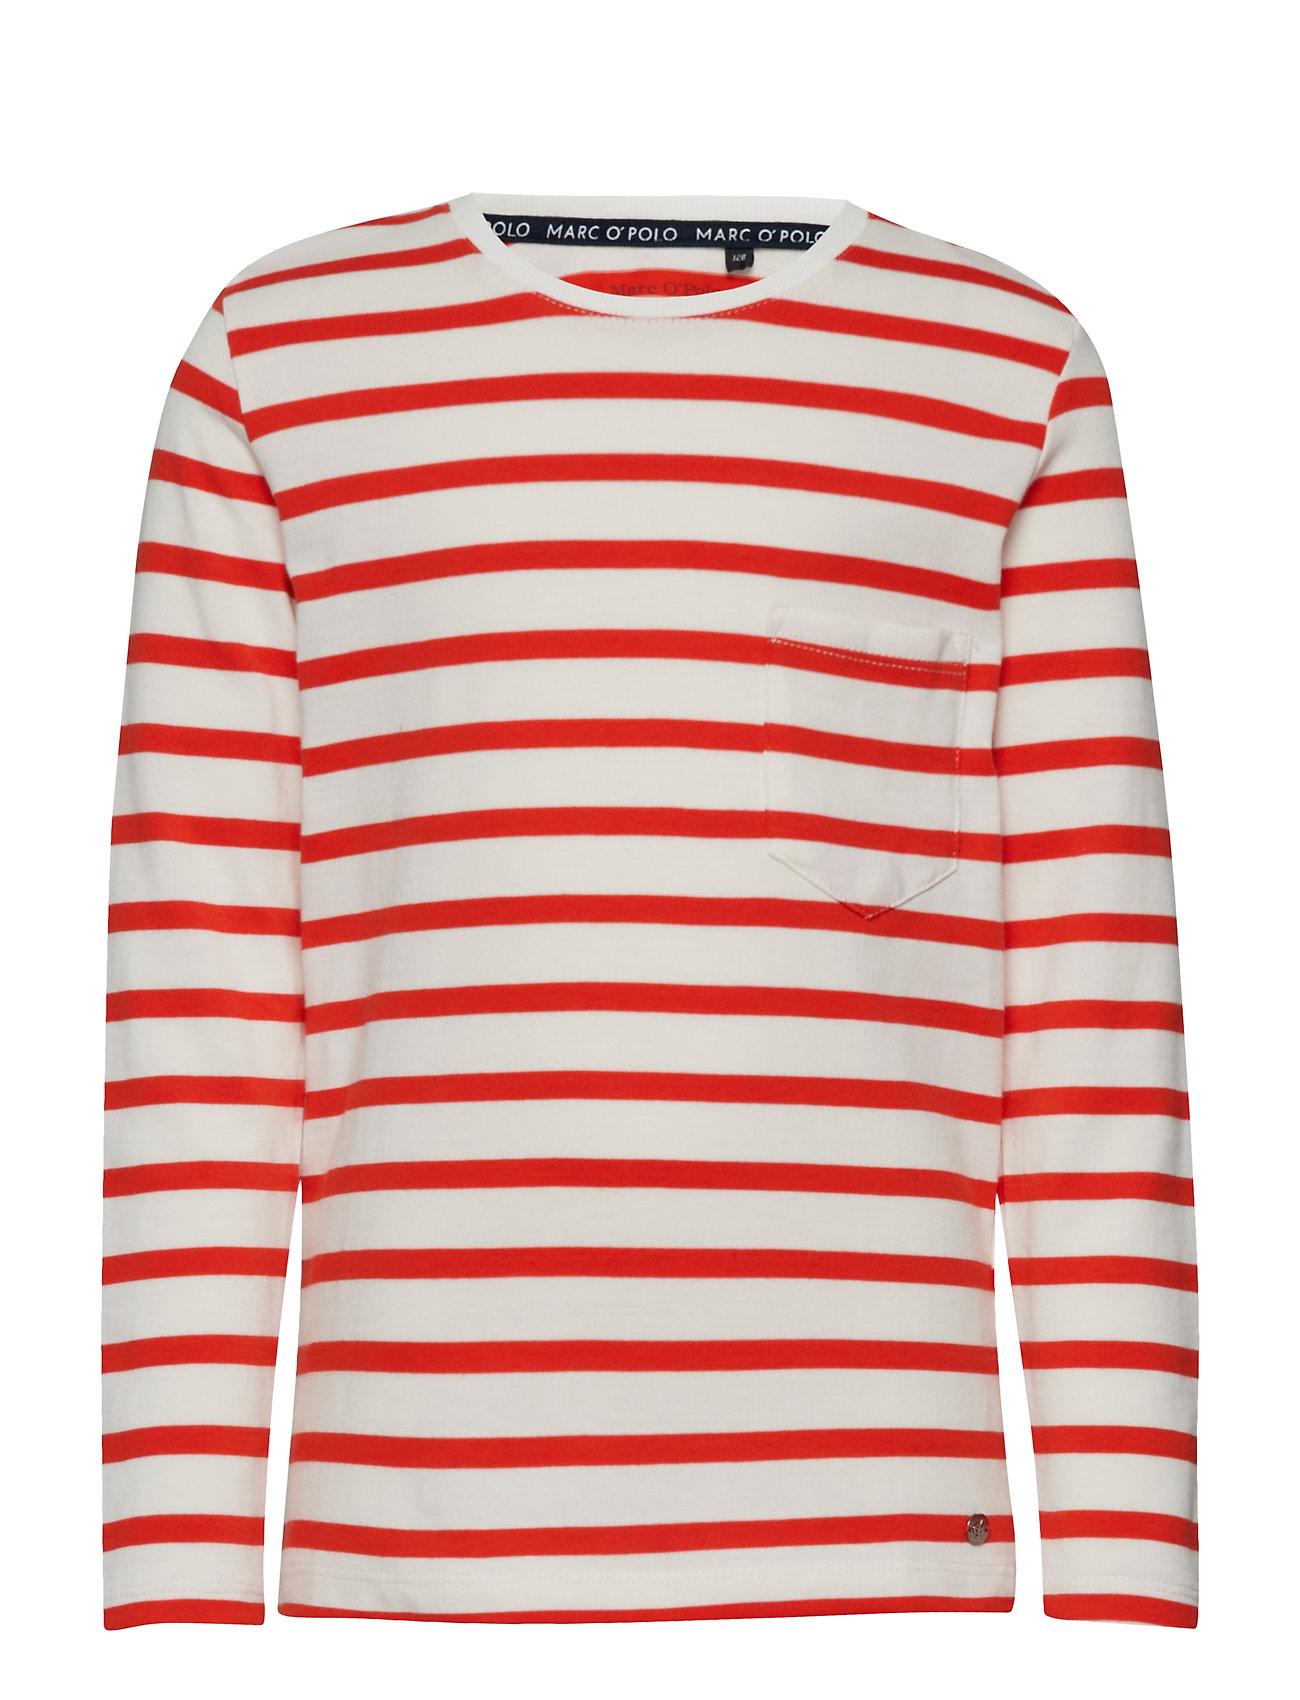 Image of T-Shirt 1/1 Arm Langærmet T-shirt Multi/mønstret MARC O'POLO JUNIOR (3131511079)